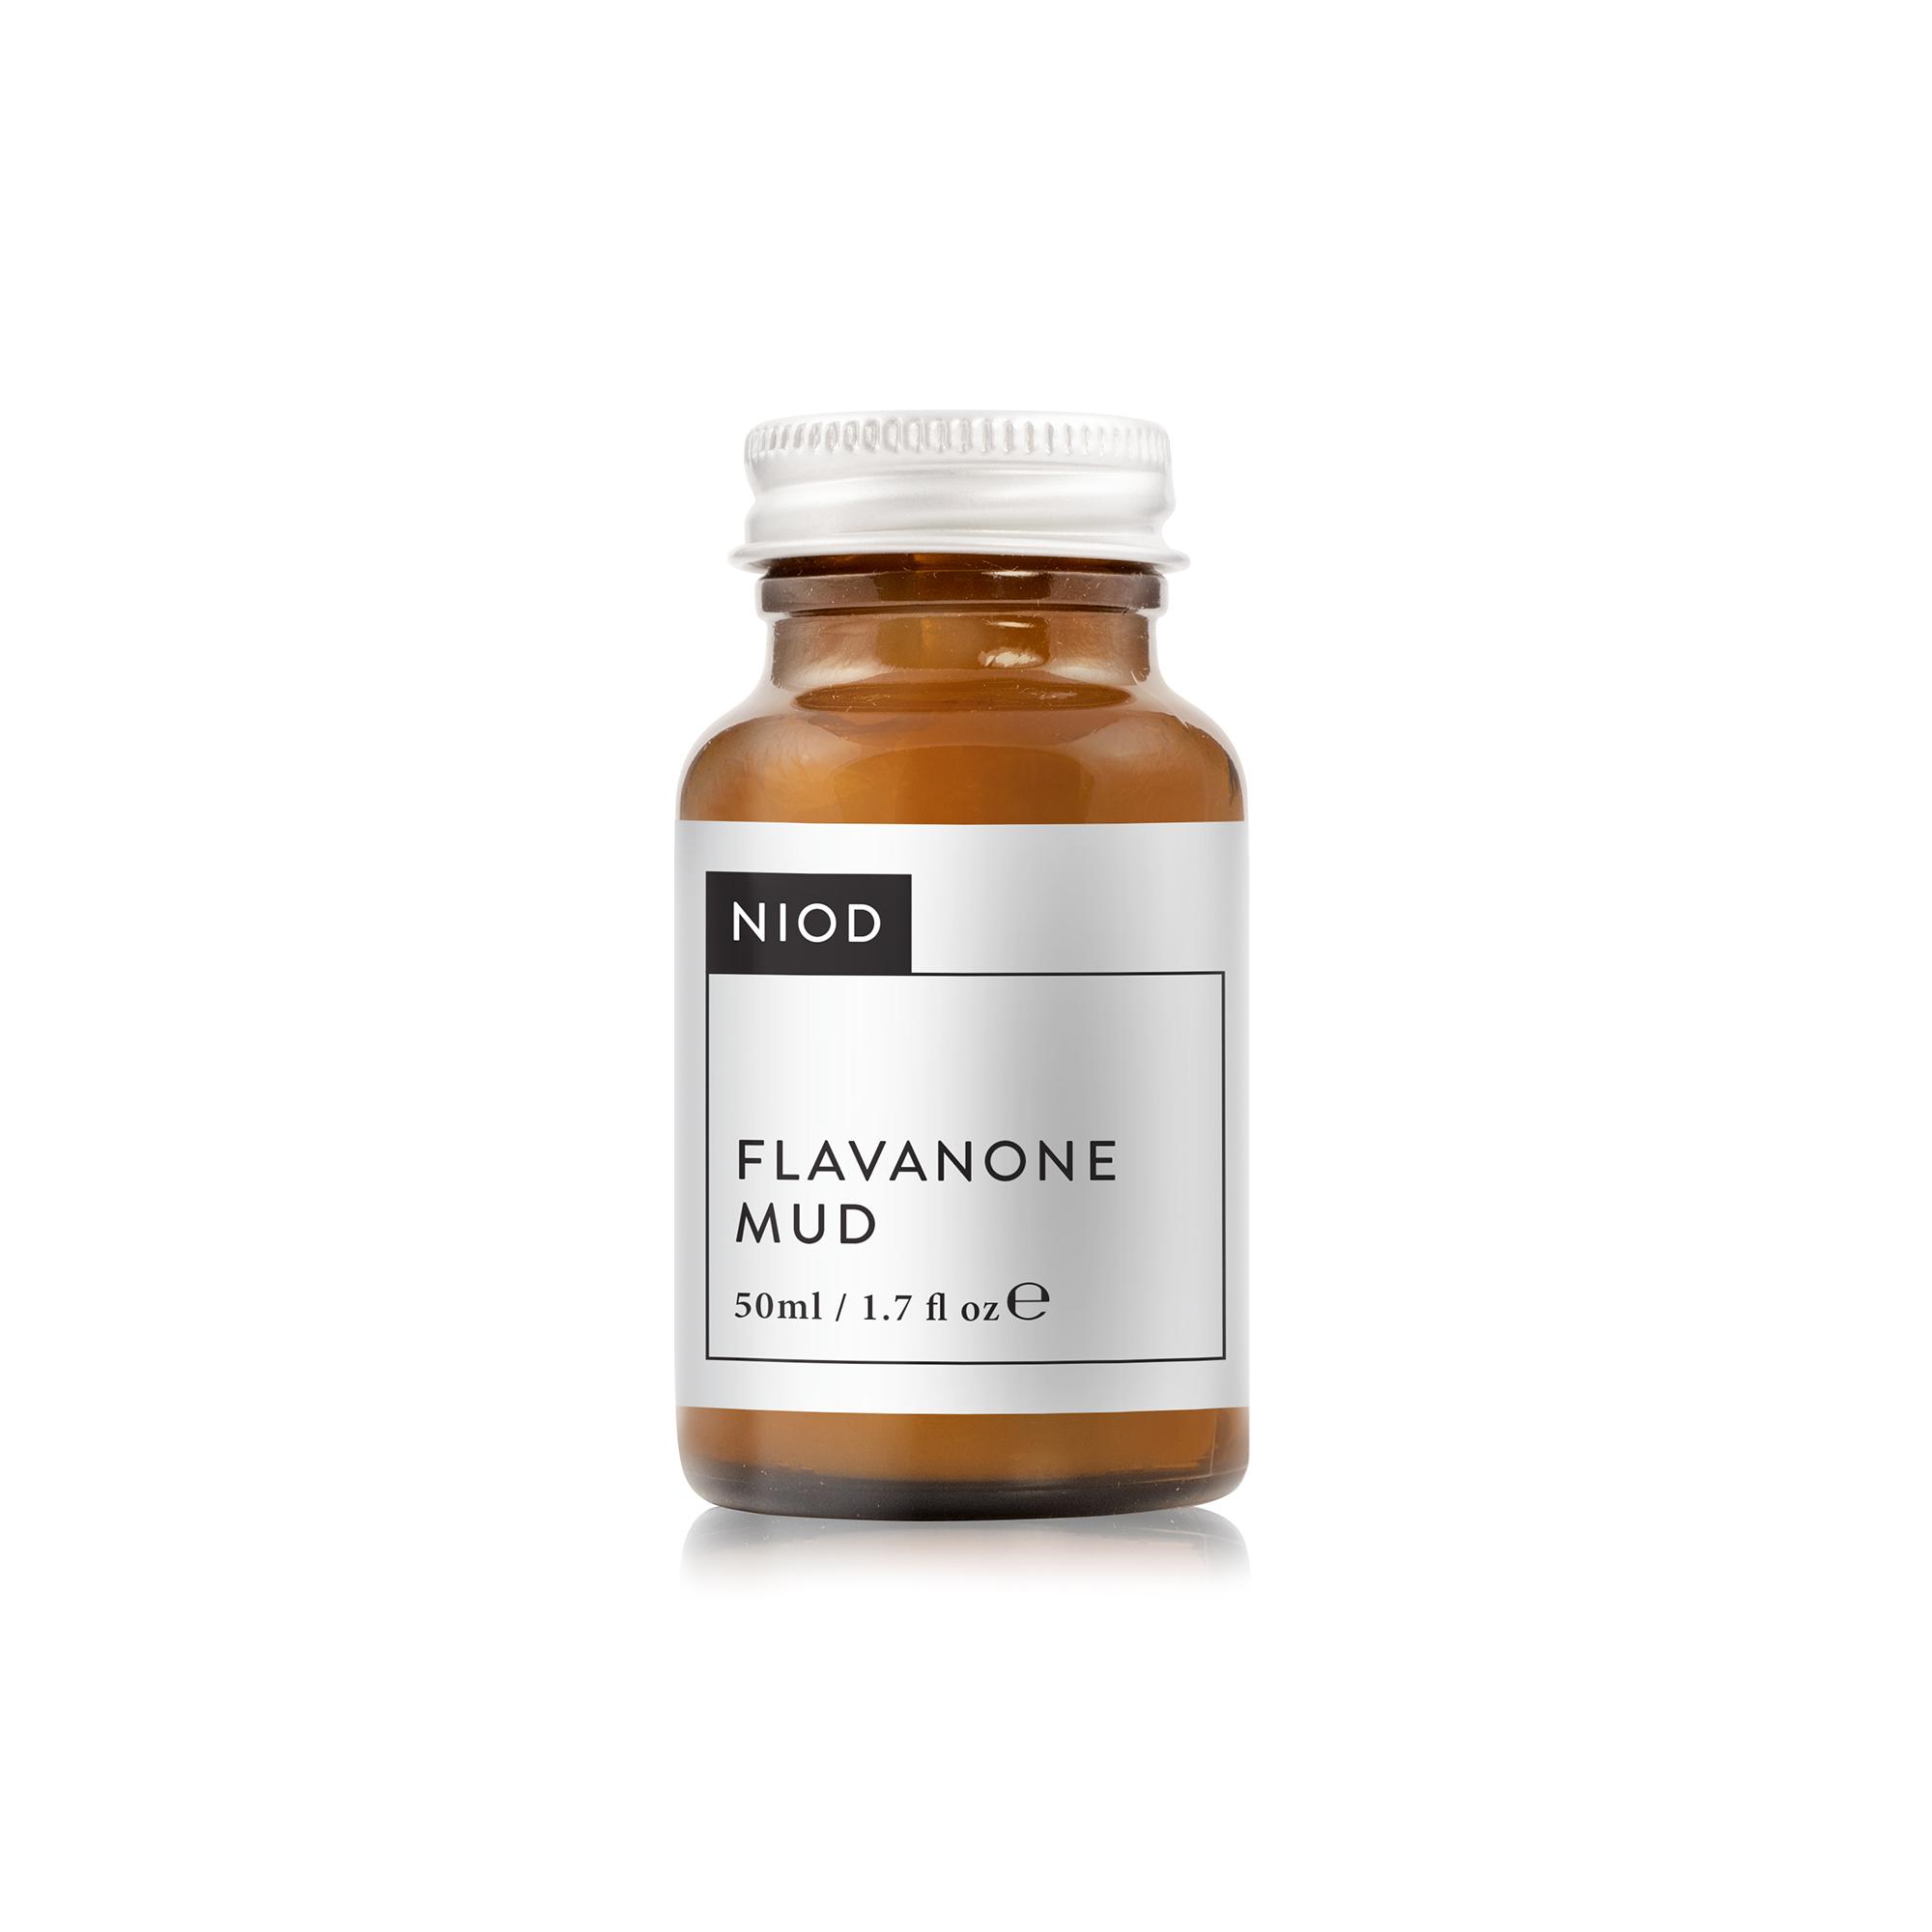 NIOD_Flavanone Mud_ansiktsmask_50ml